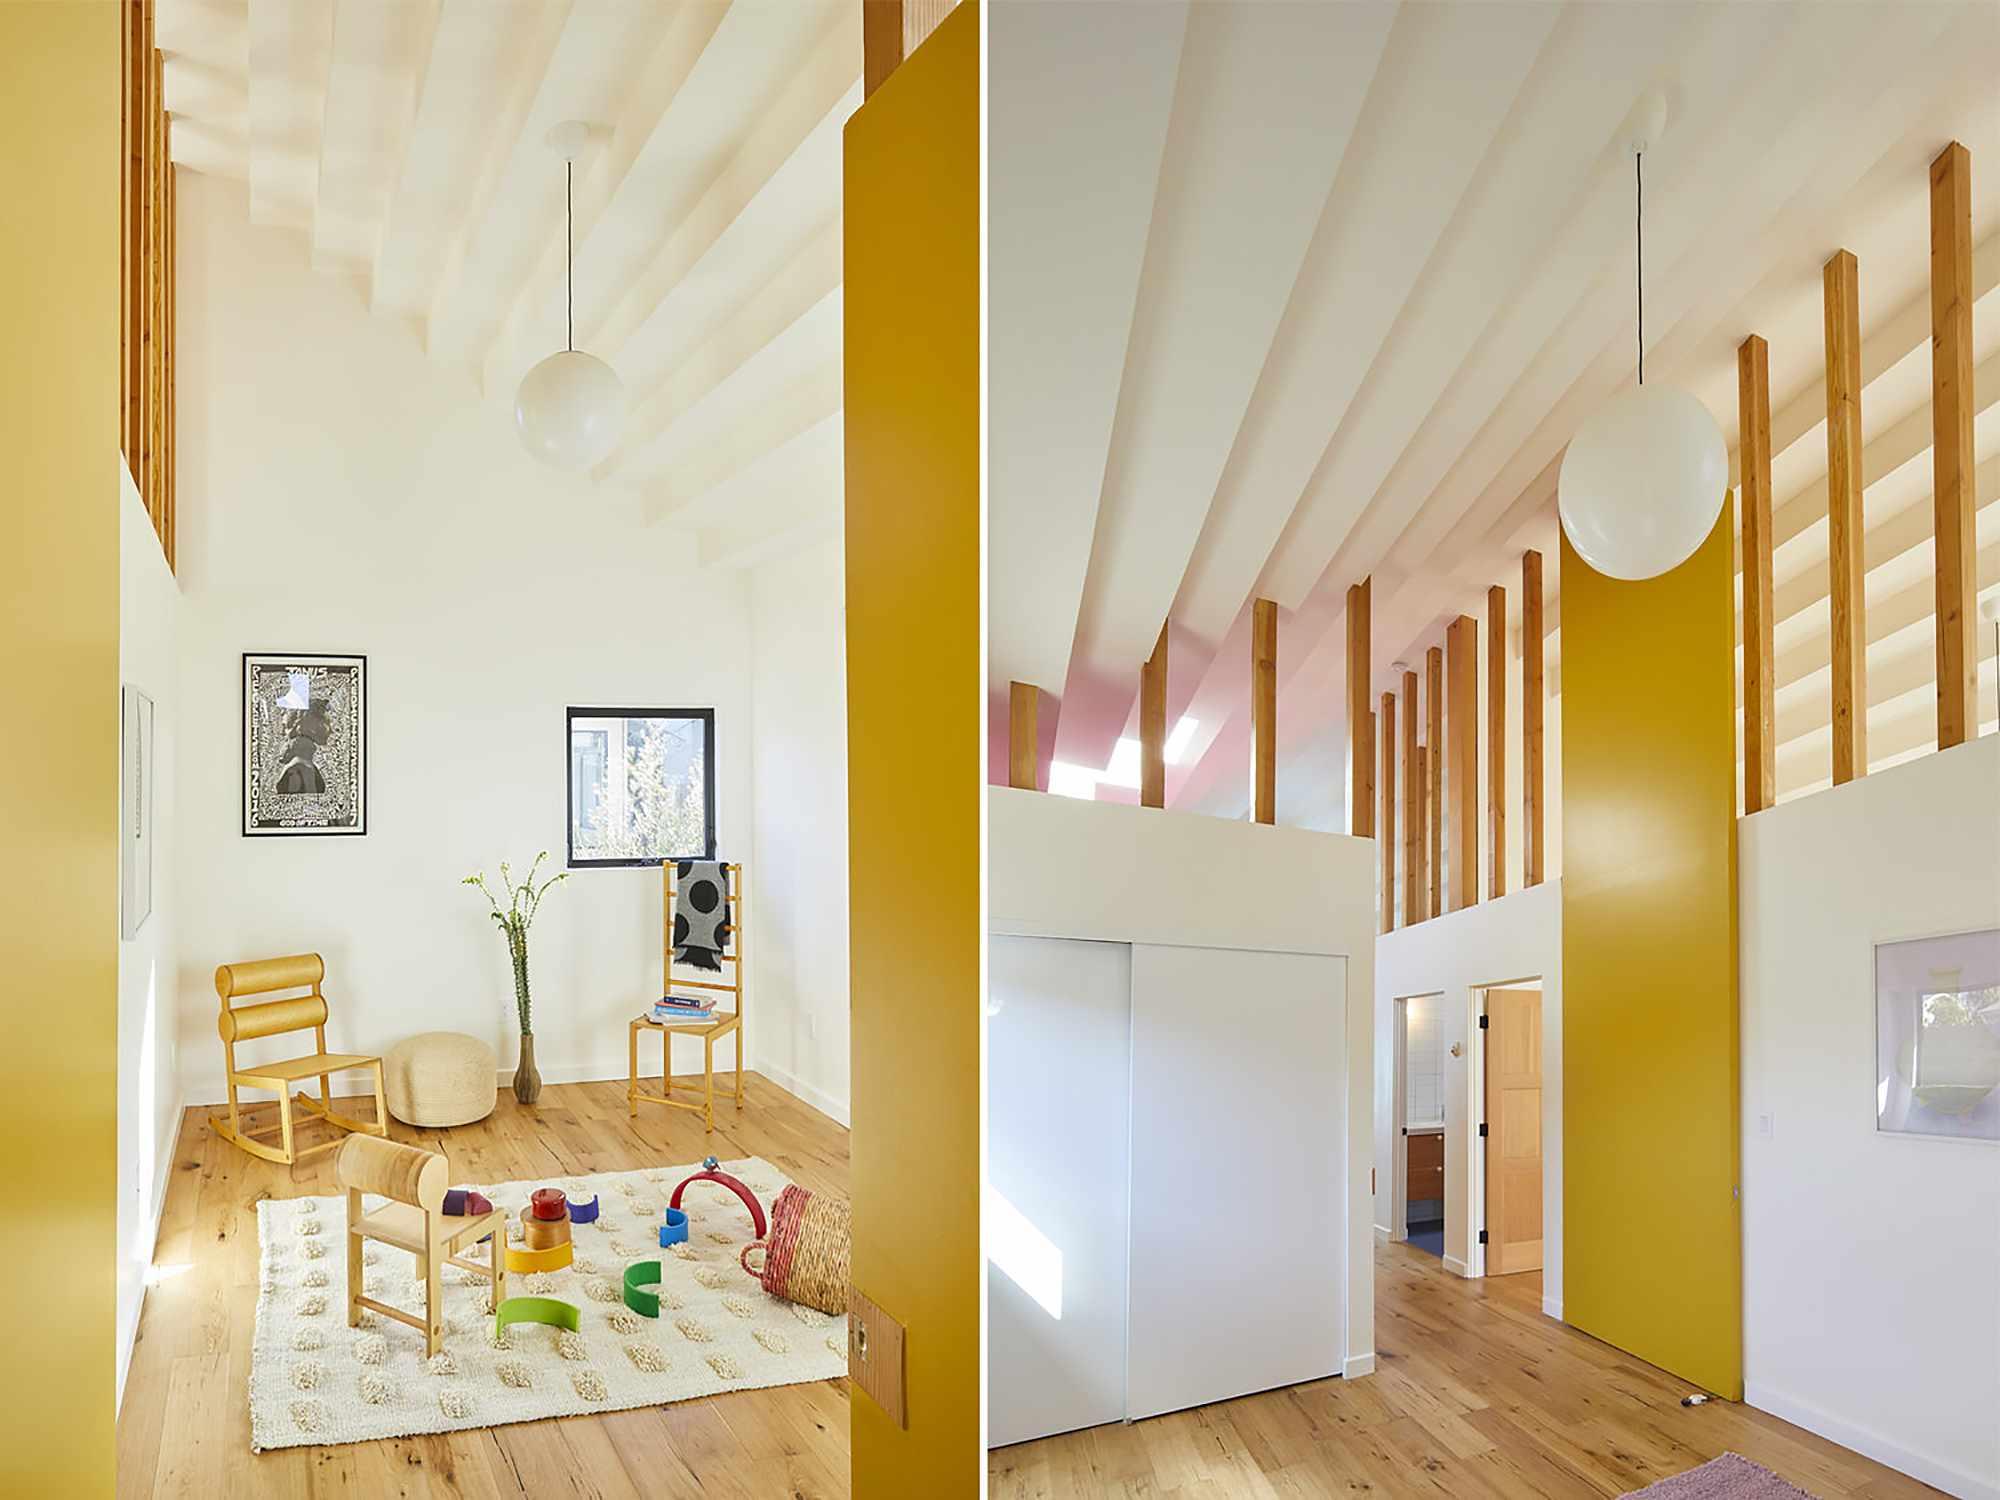 Highland Park ADU by Bunch Design Yoshiro MakinoHighland Park ADU by Bunch Design bedroom